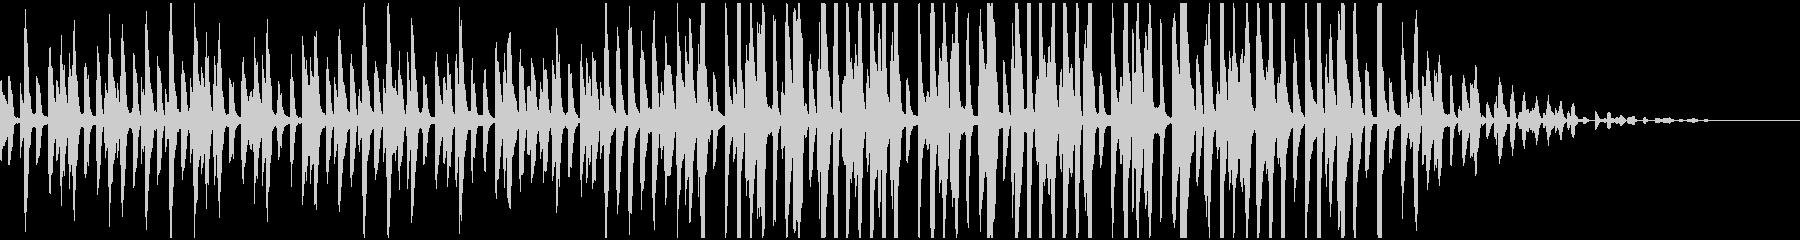 BGMやCMに 軽快なピアノ曲の未再生の波形